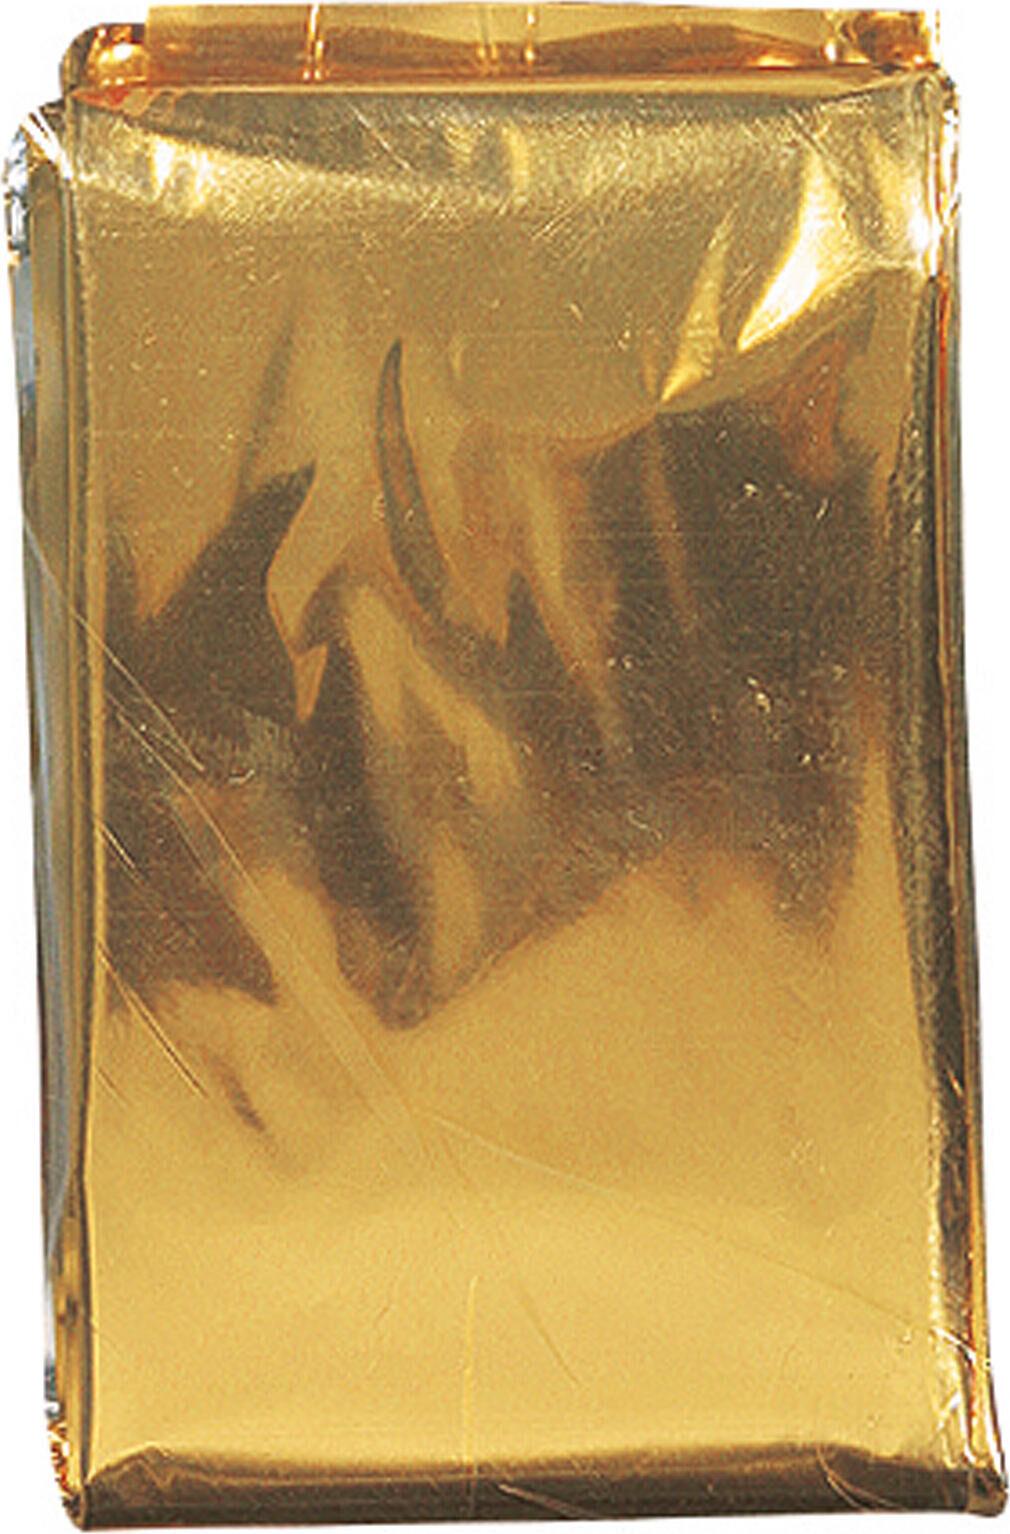 Tatonka Rettungsdecke gold (028)